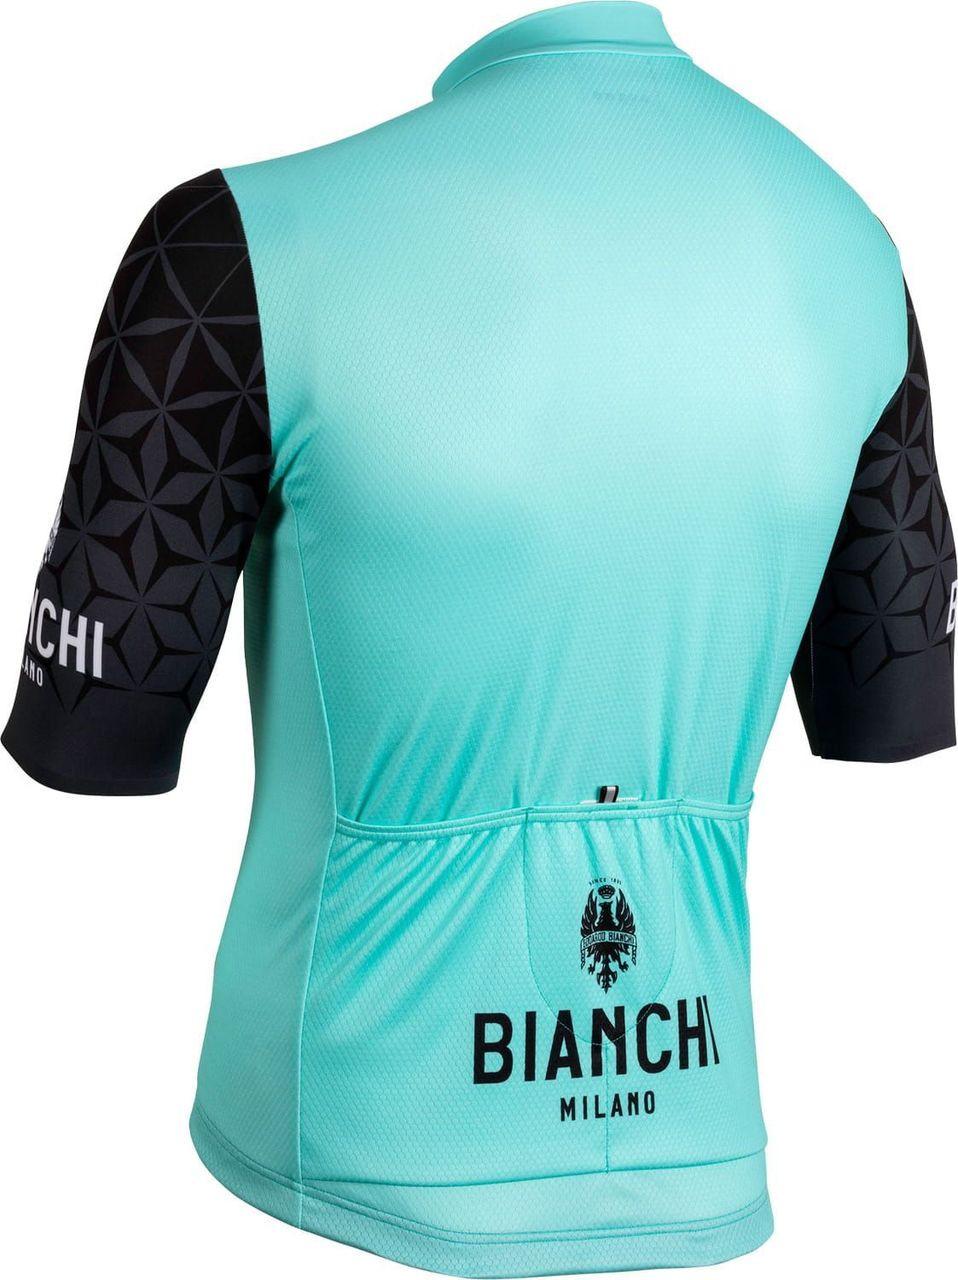 Bianchi Milano Pedaso Green Black Jersey Rear